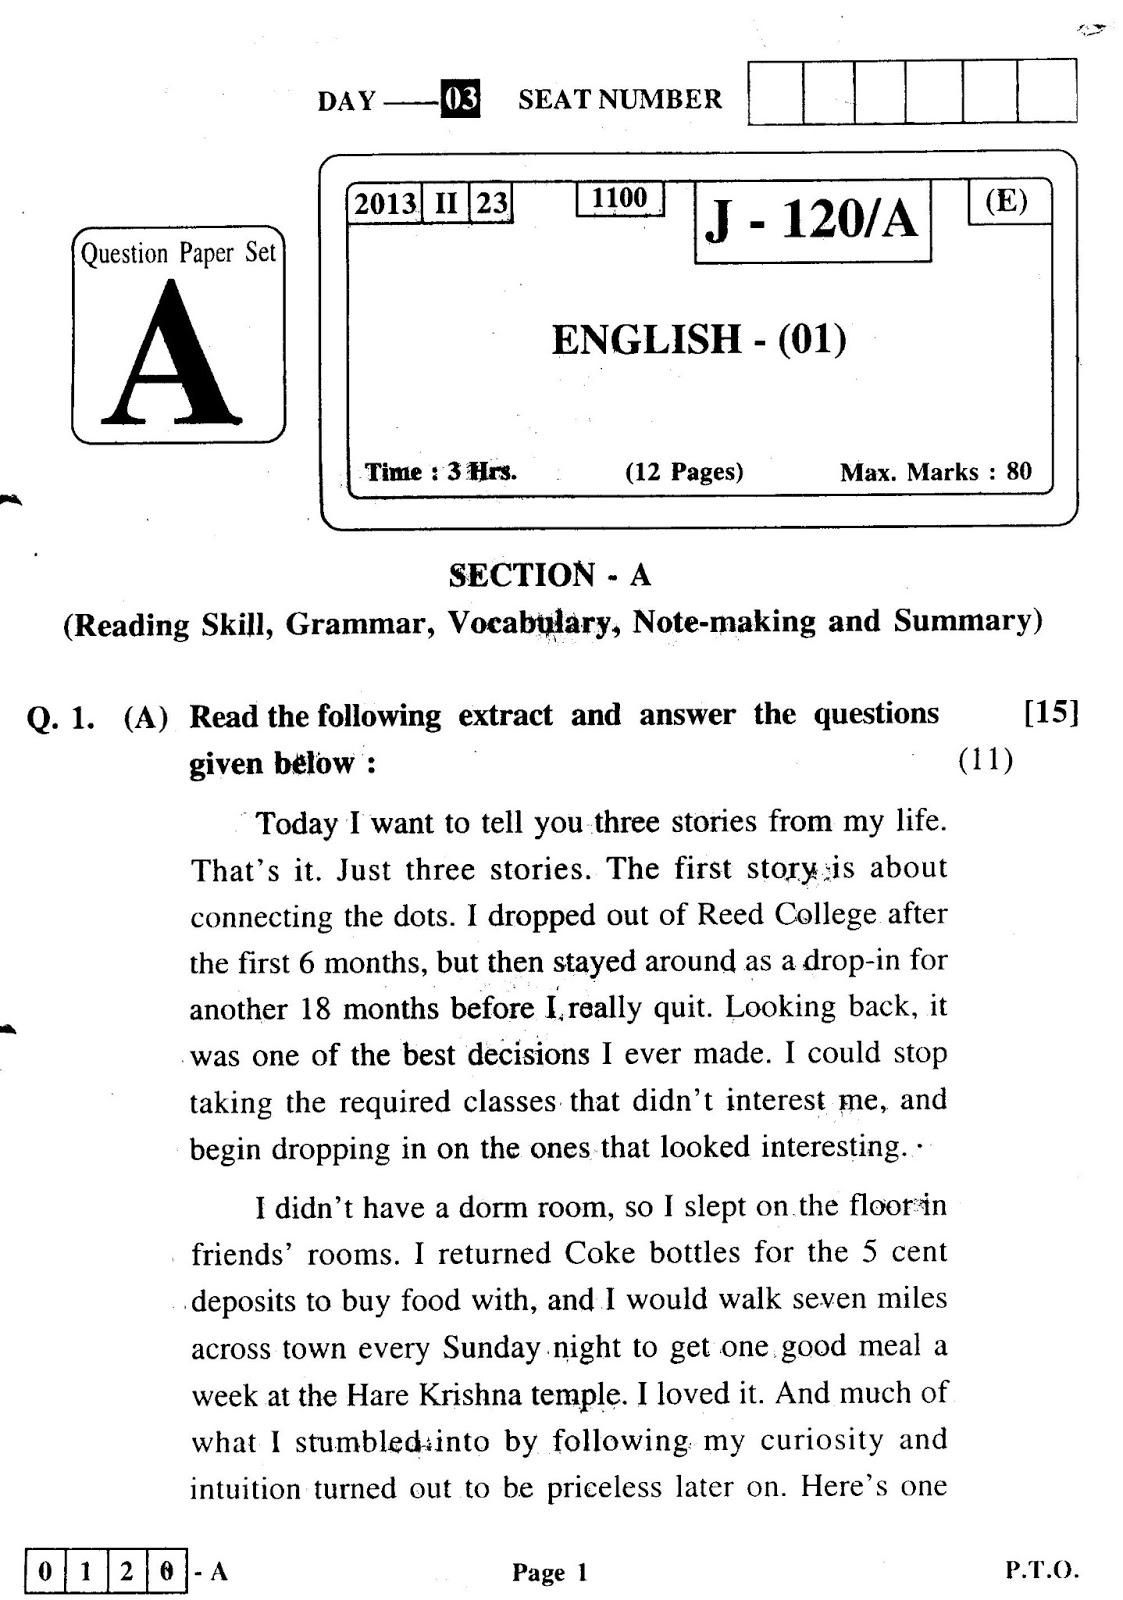 Hsc english paper | Homework - August 2019 - 3267 words